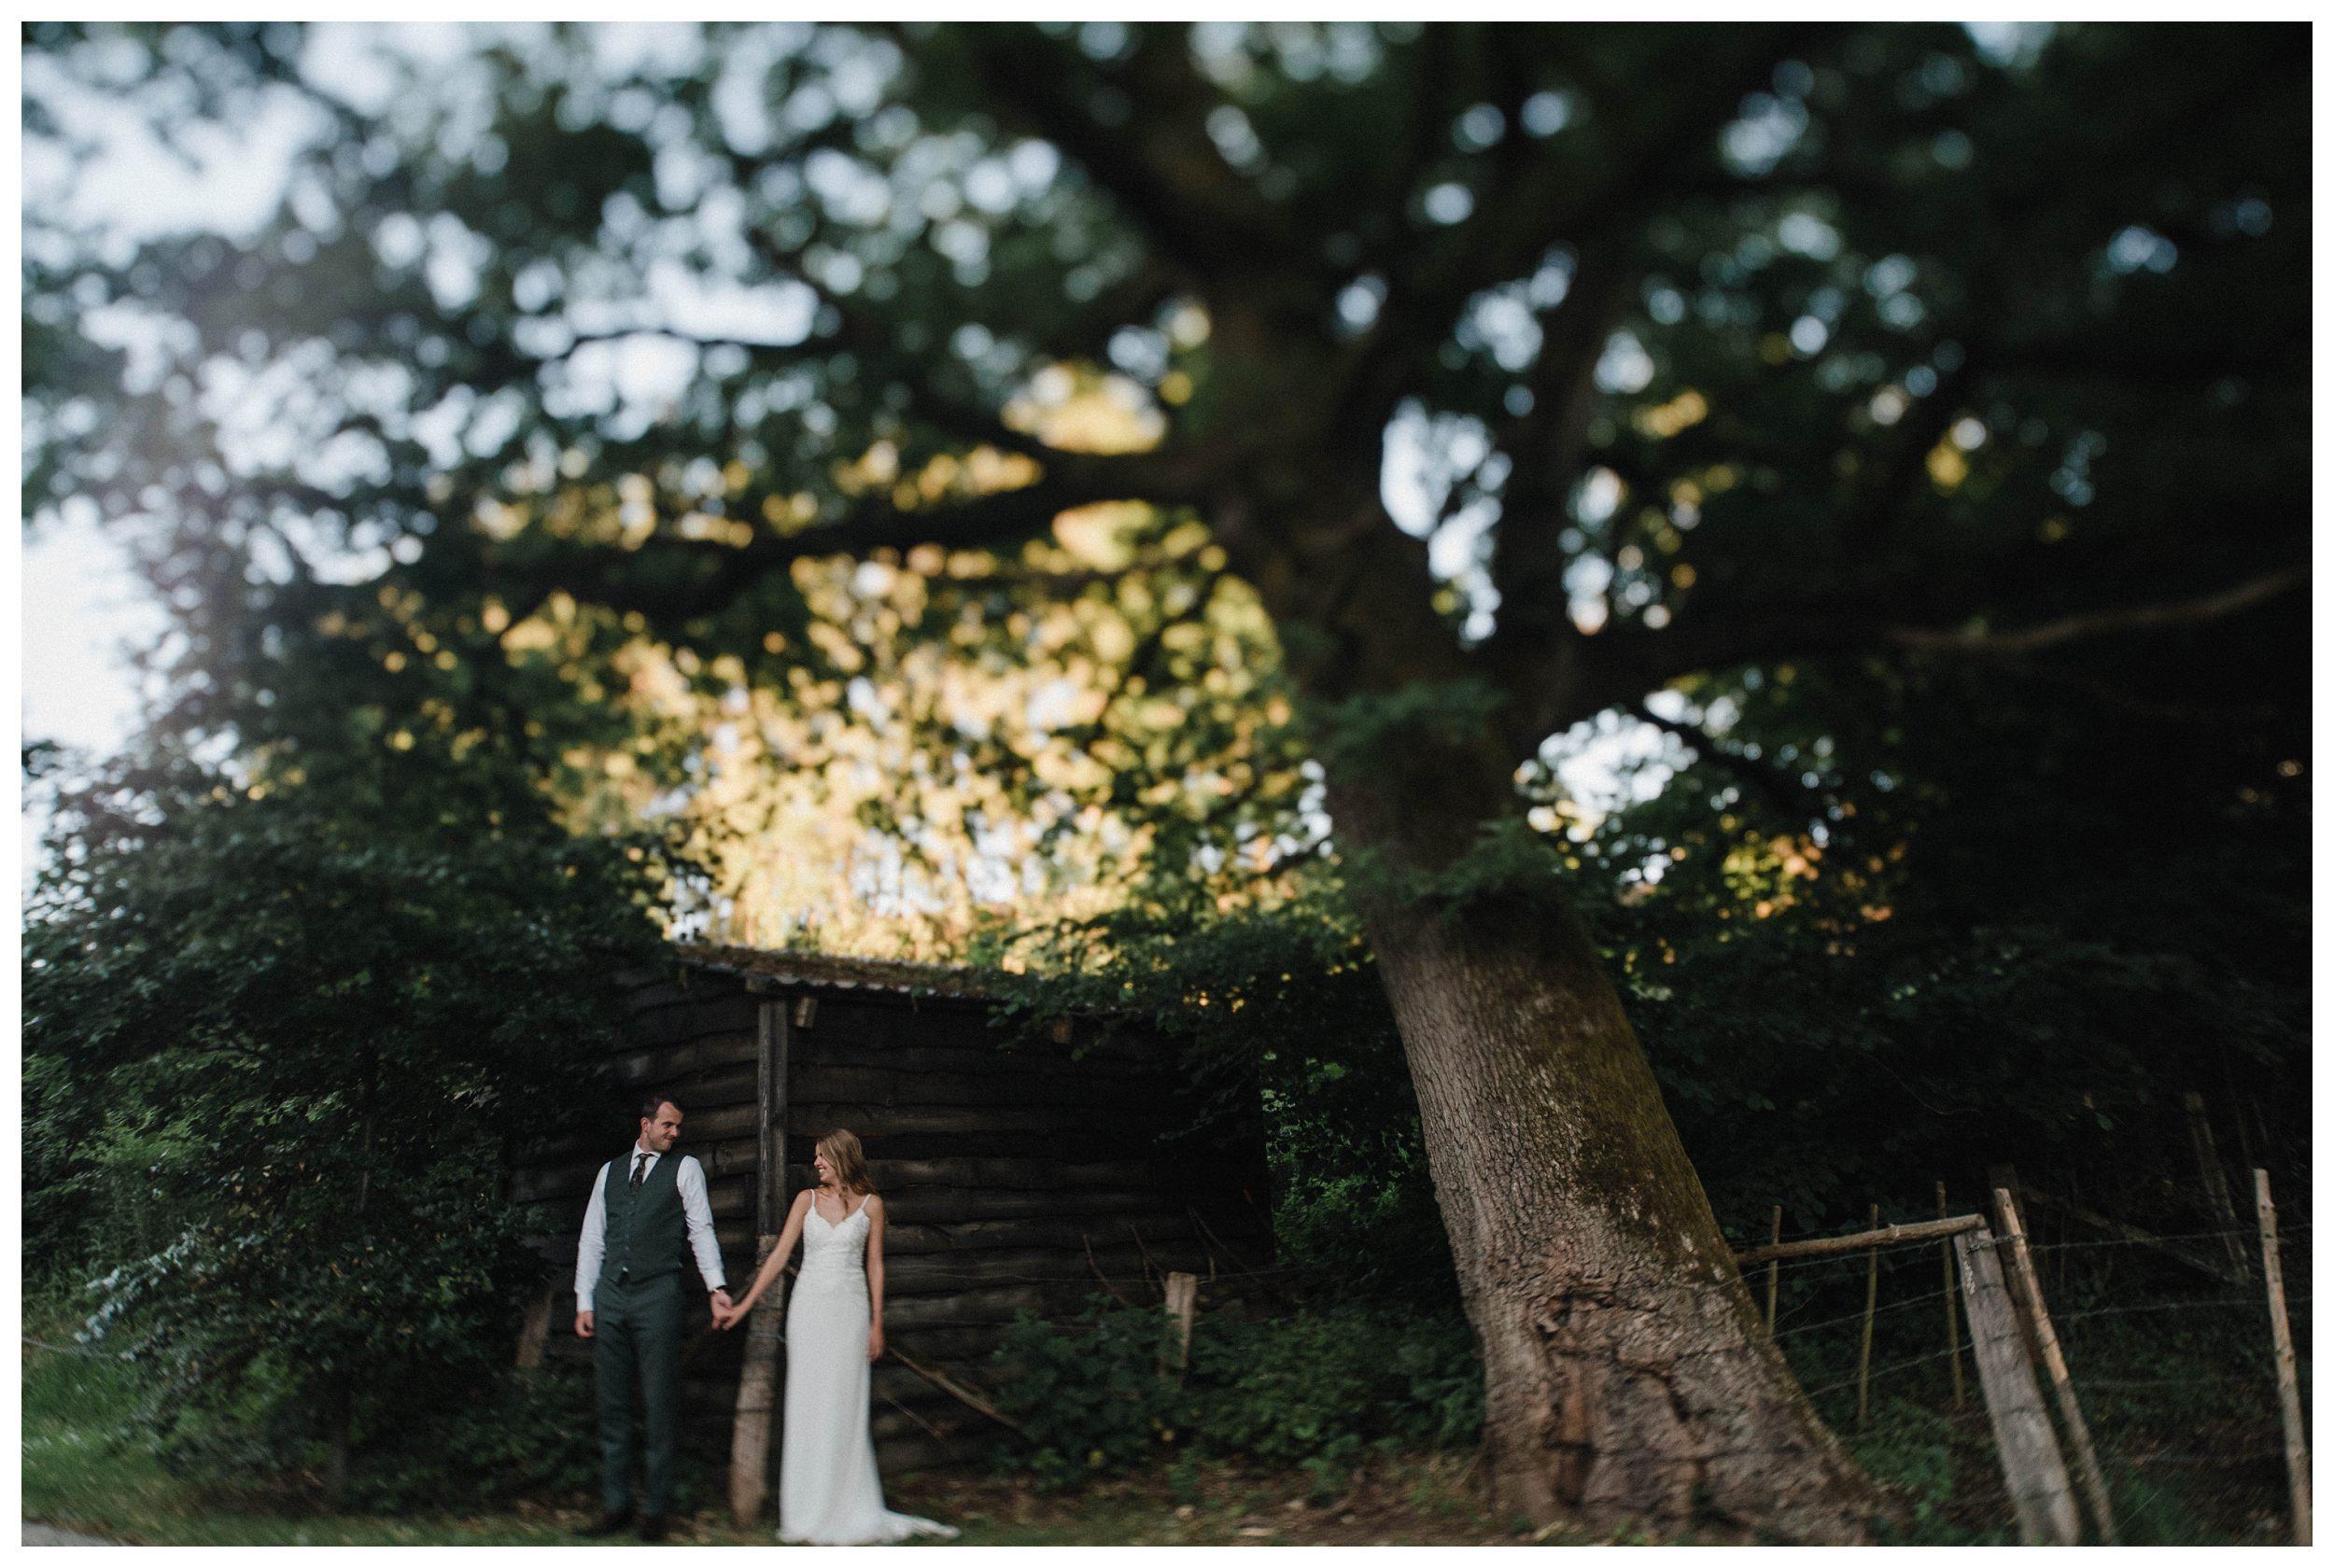 huwelijksfotograaf bruidsfotograaf destinationwedding huwelijksfotografie in ardennen nederland (81).jpg